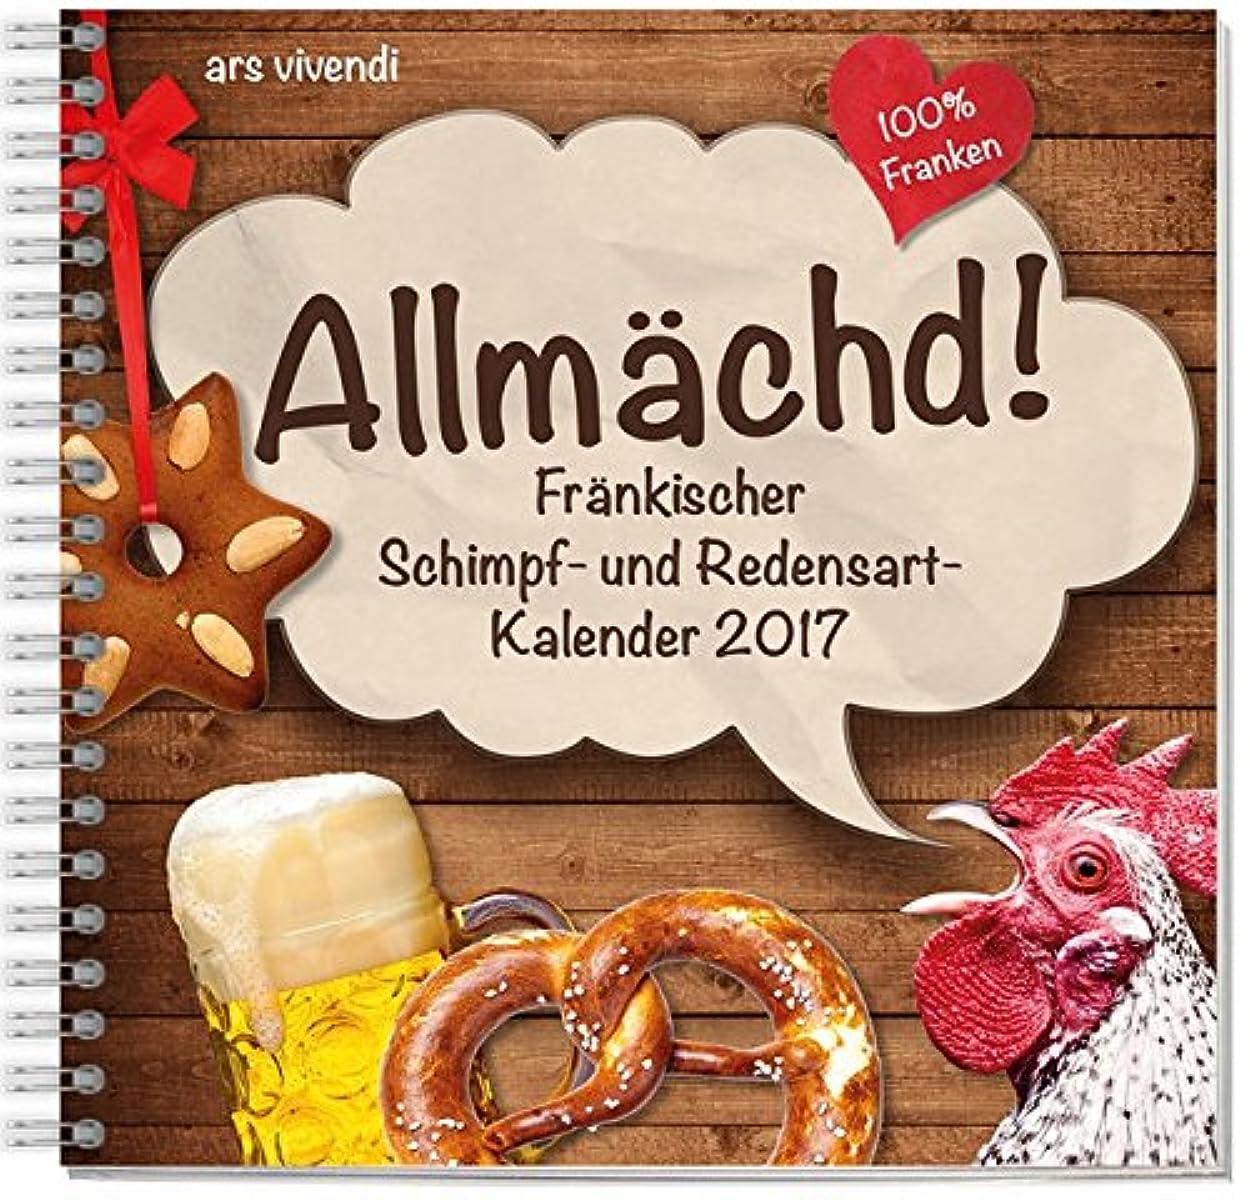 休日に歯車謝罪するAllmaechd-Kalender 2017: Fraenkischer Schimpf- und Redensart-Kalender, Tischkalender